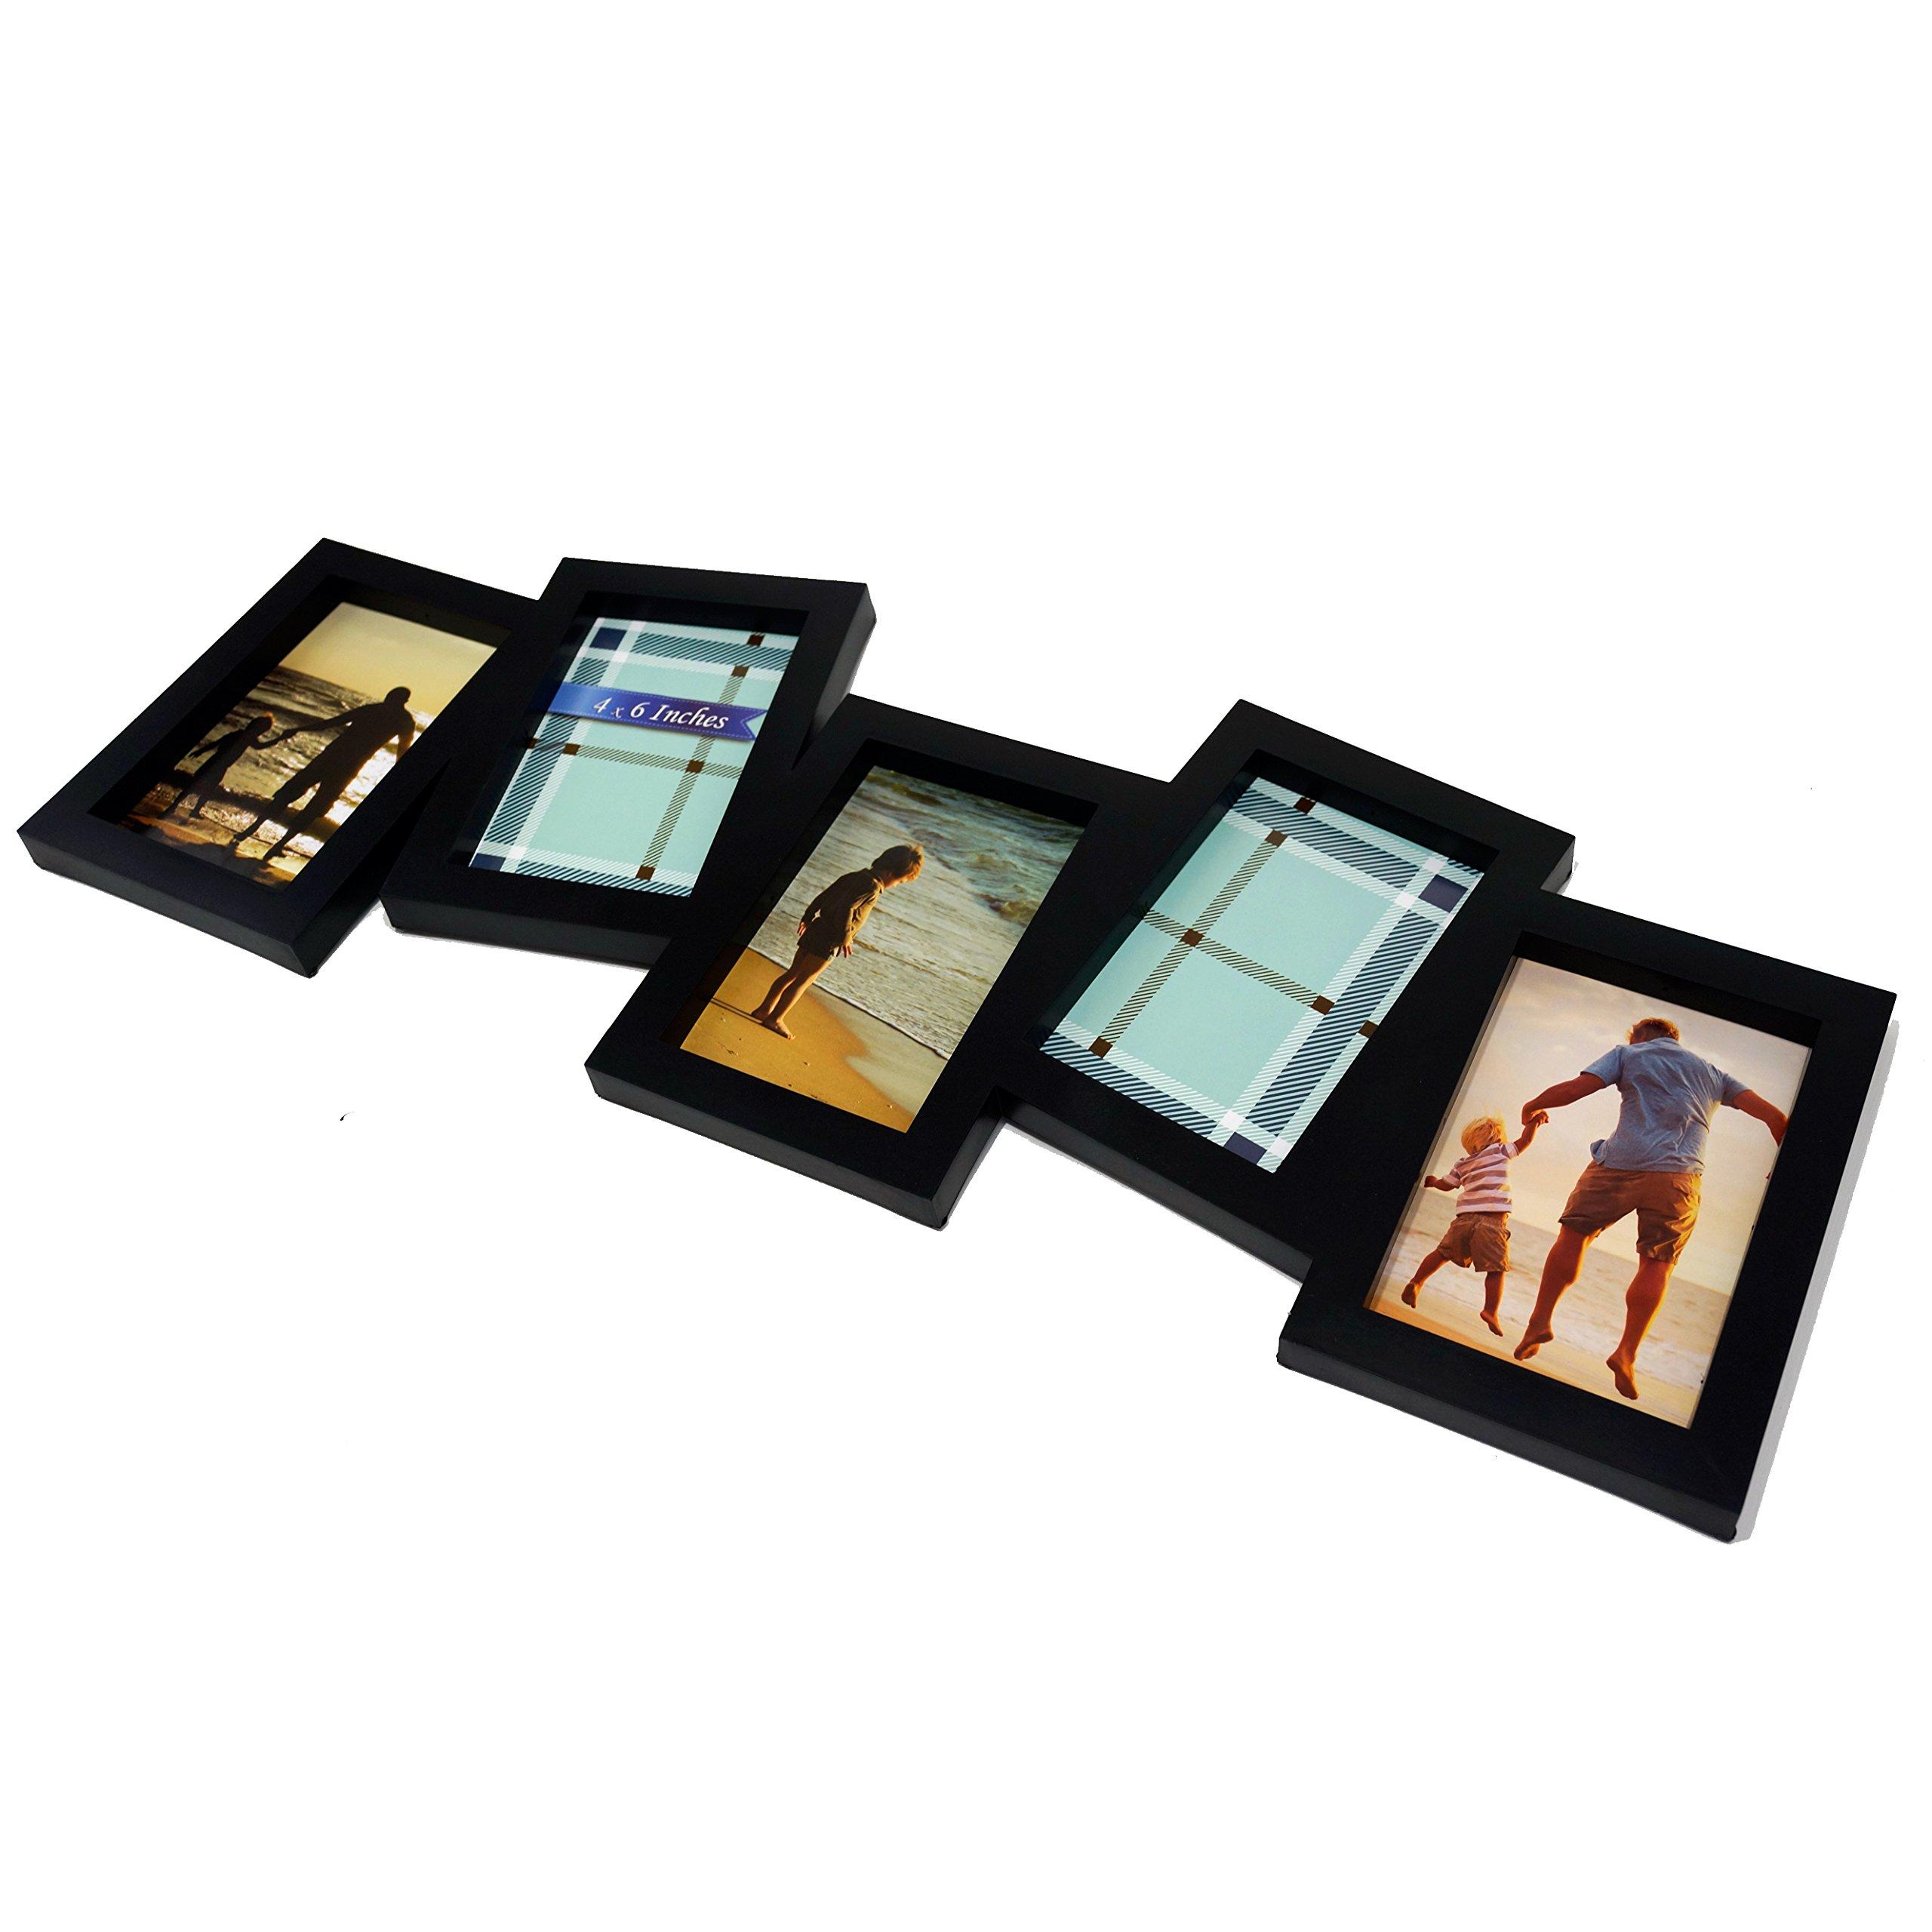 BestBuy Frames 5 Opening Collage and Multiple Frames - Fits Standard ...